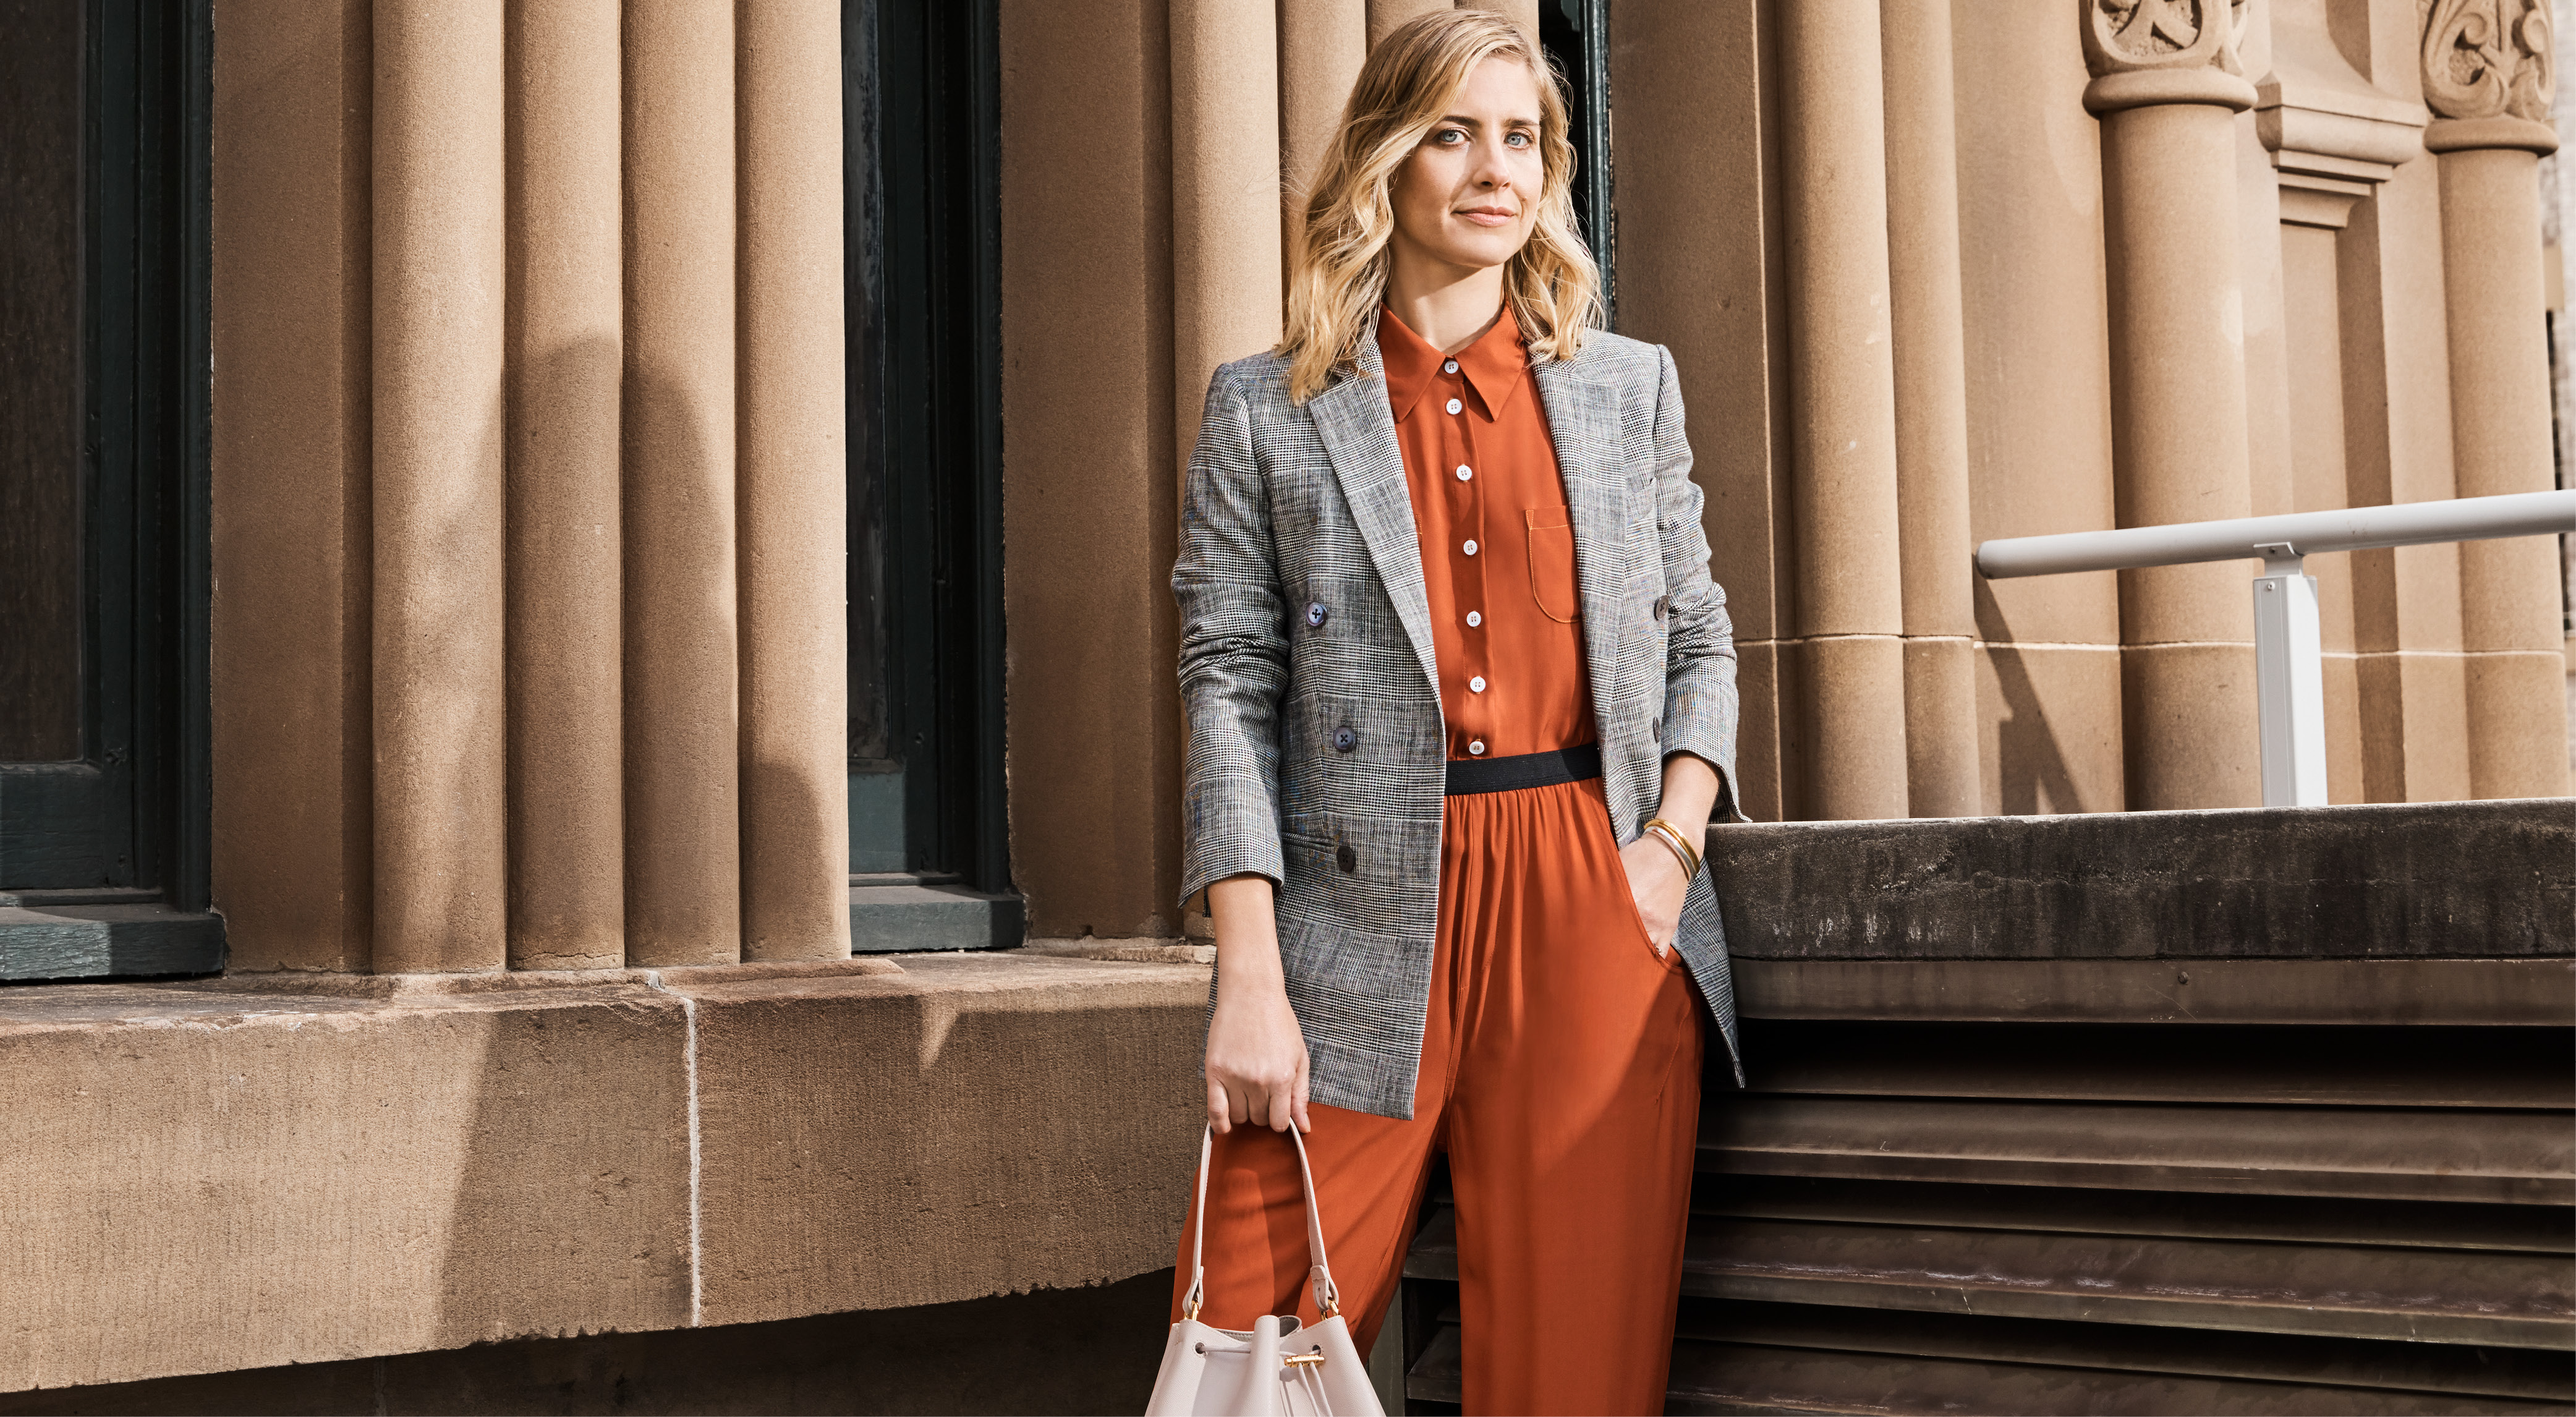 Meet Kari Arnison, Head of Marketing at Schroders